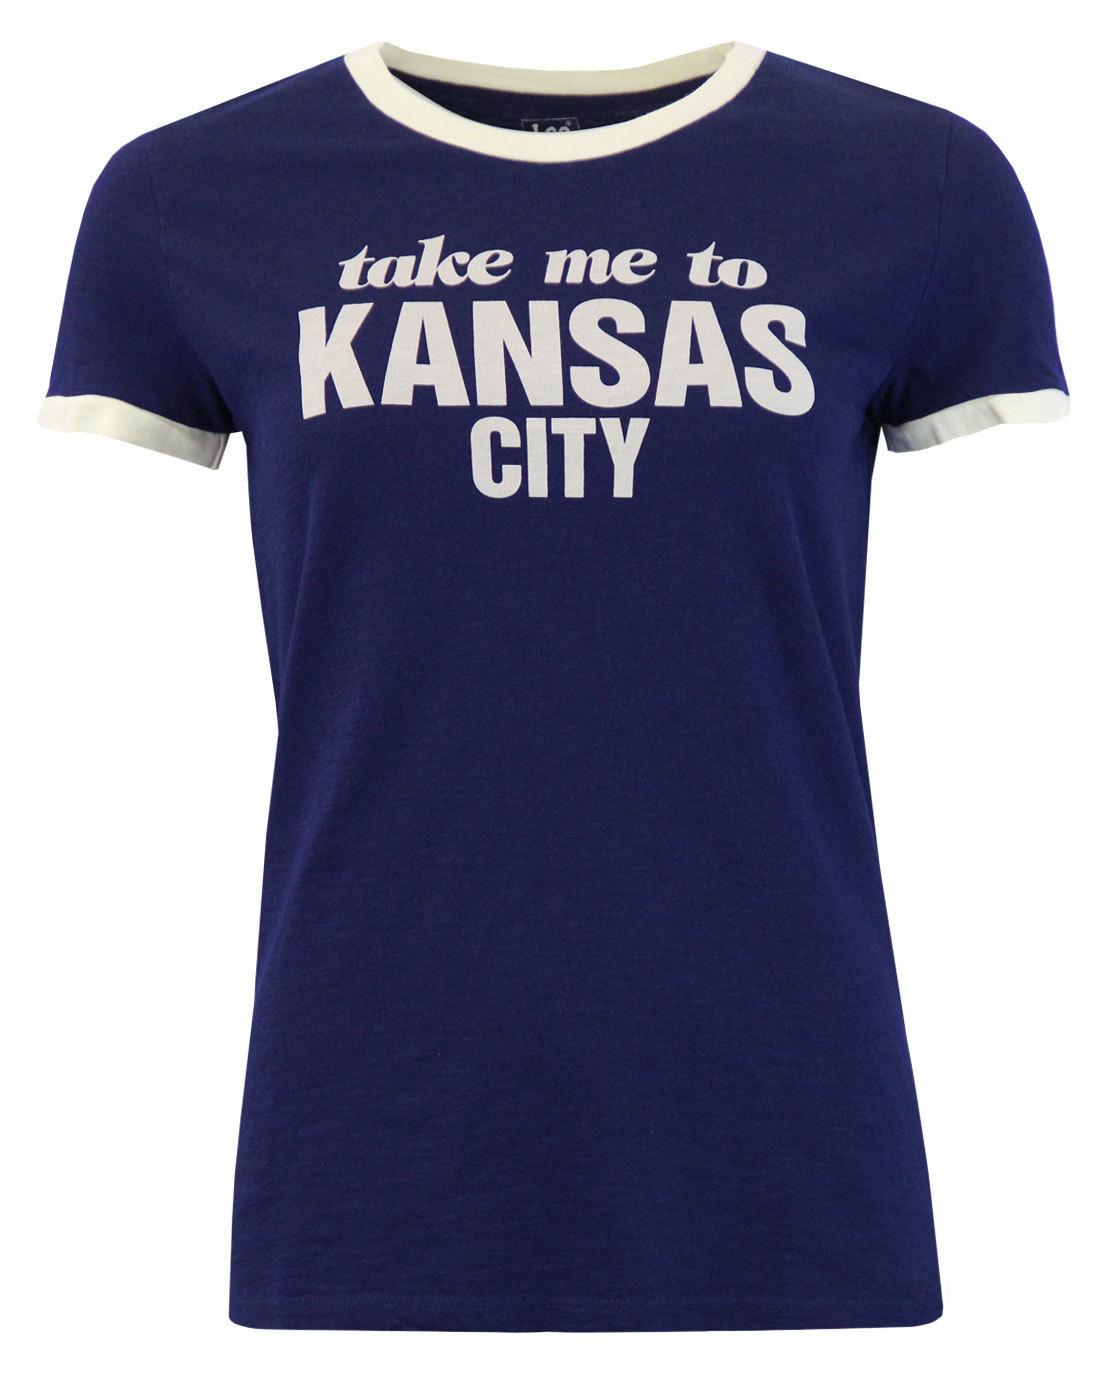 Kansas City LEE Retro 70s Vintage Ringer Tee BLUE